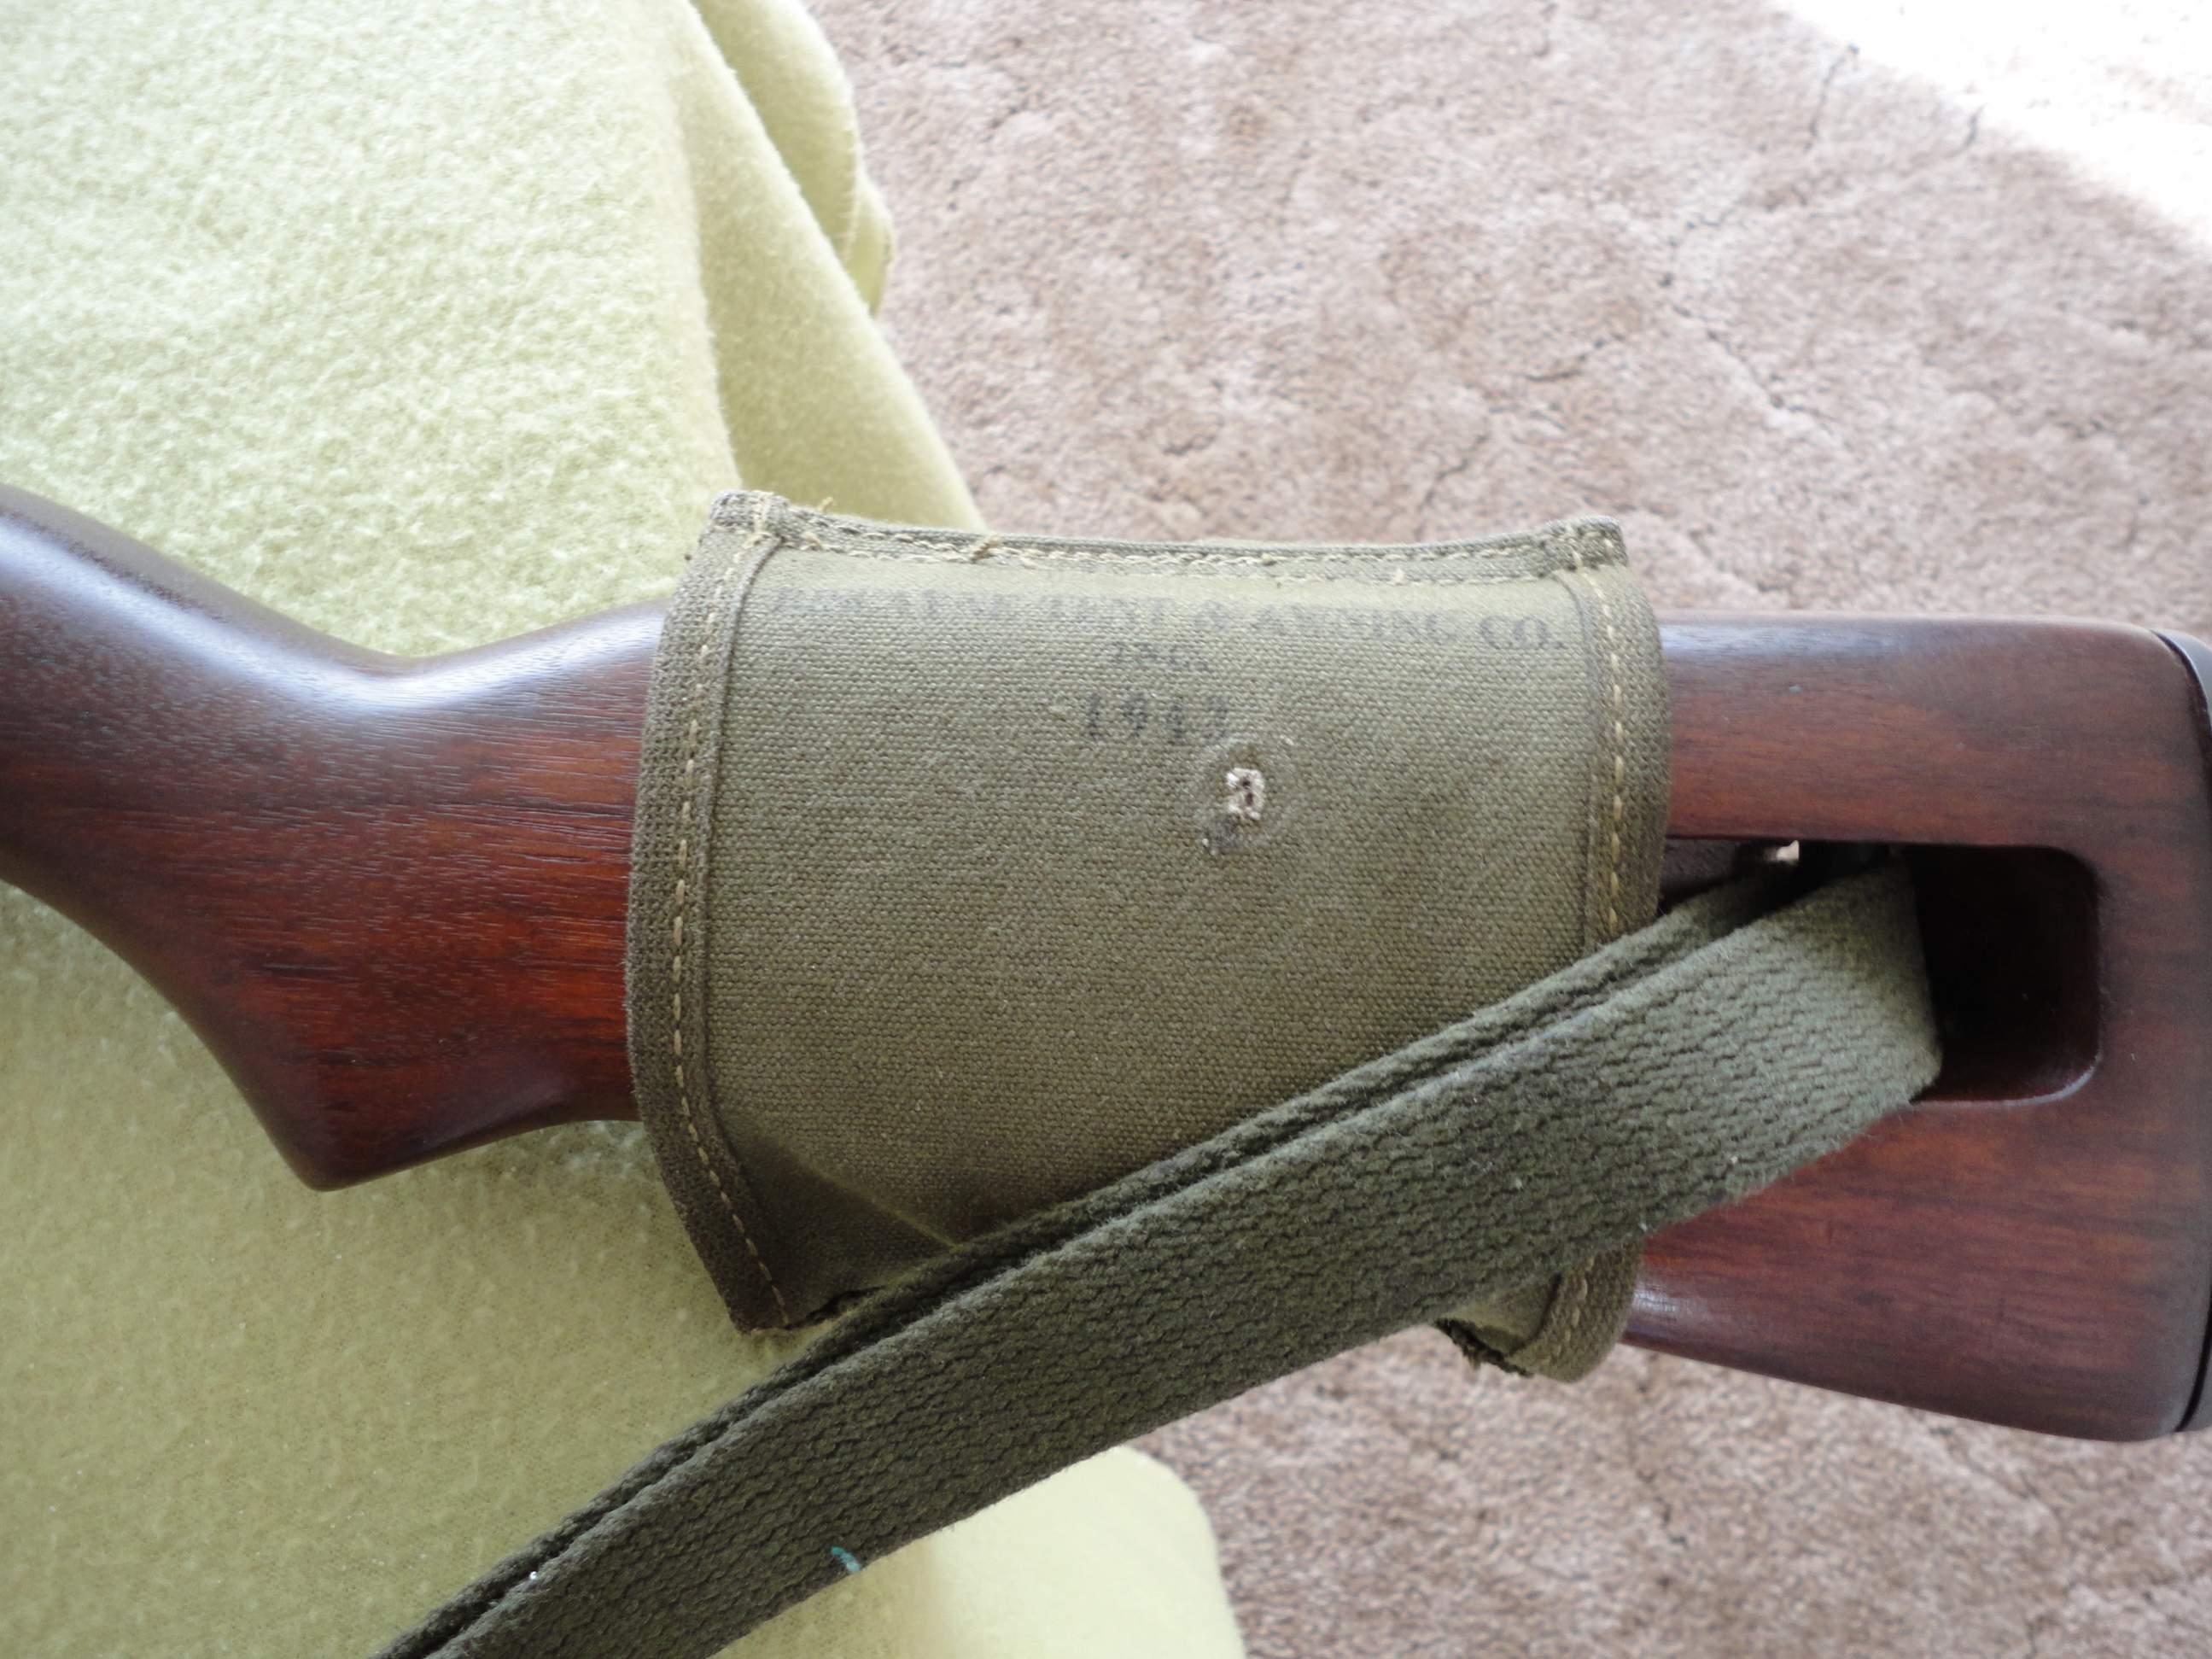 Mag Pouch Gun And Game The Friendliest Gun Discussion Forum Online